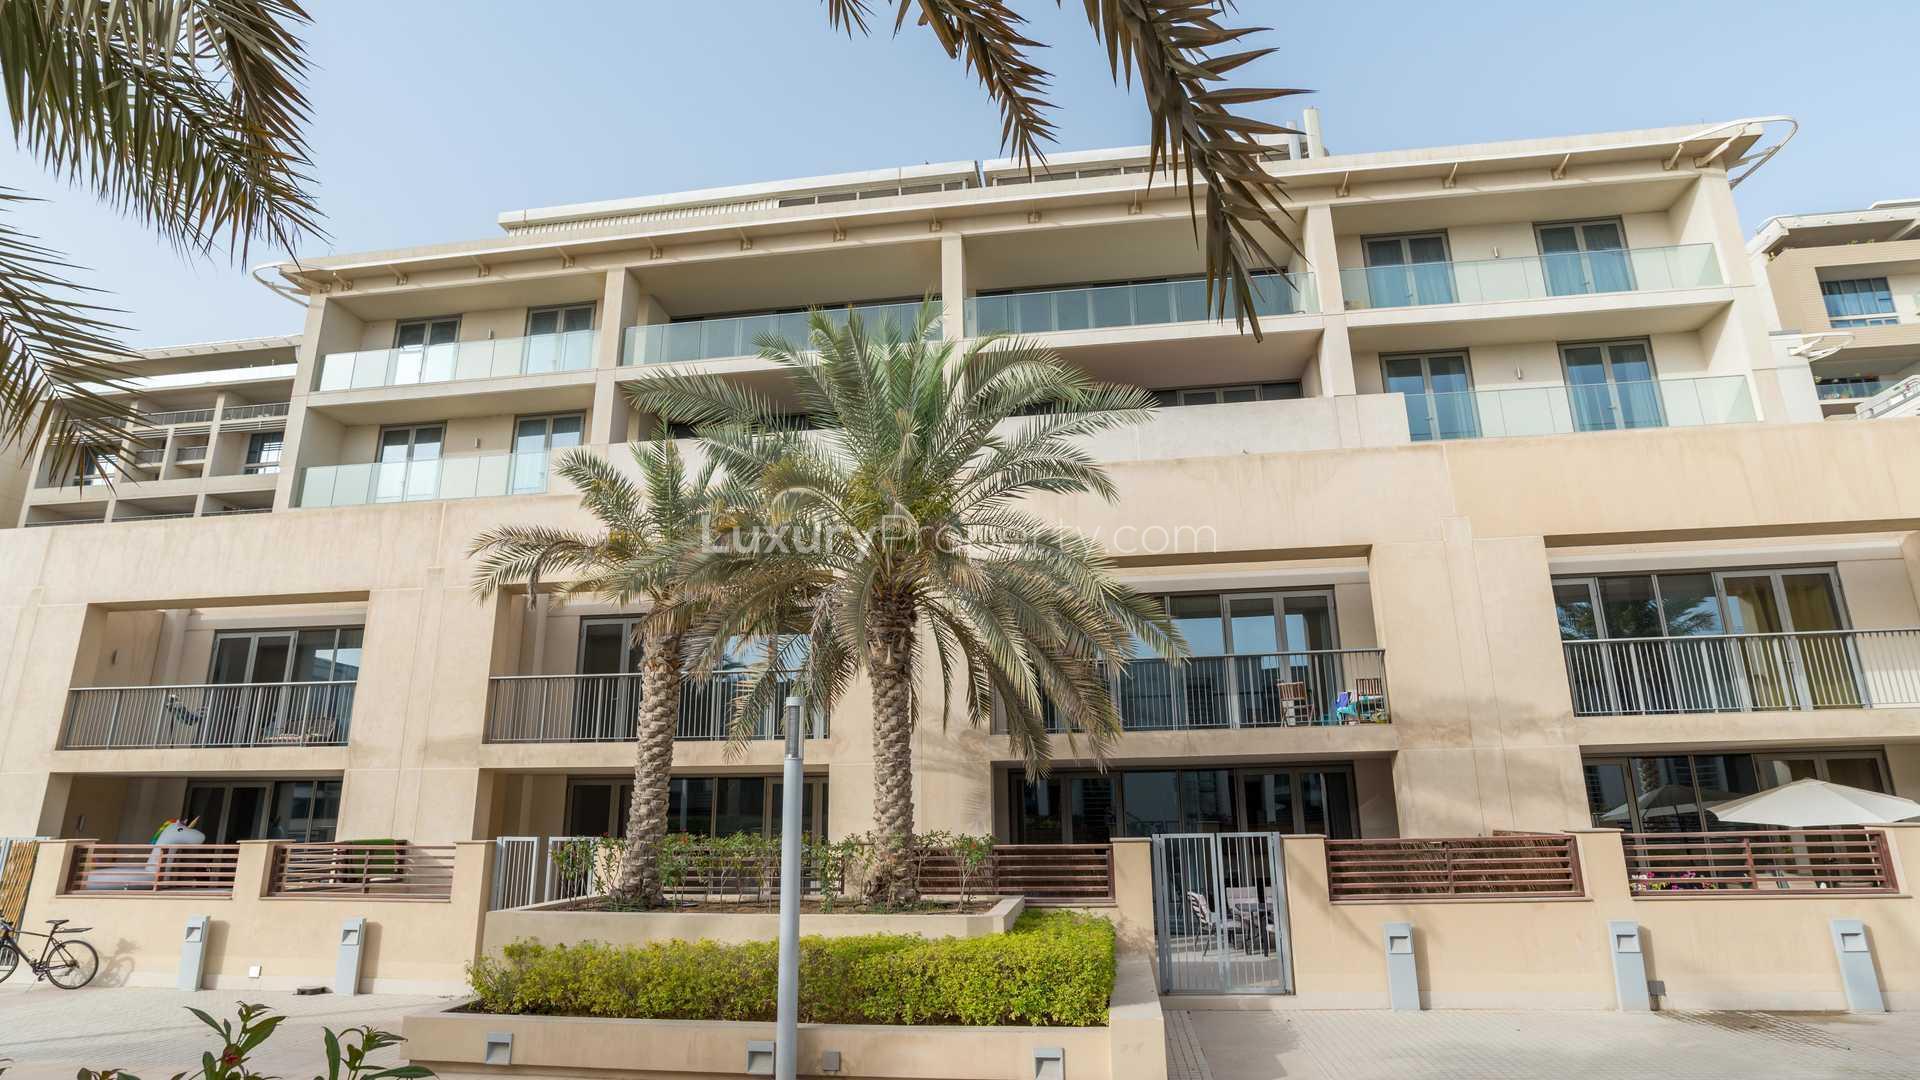 Properties for Sale in Al Raha Beach, Abu Dhabi